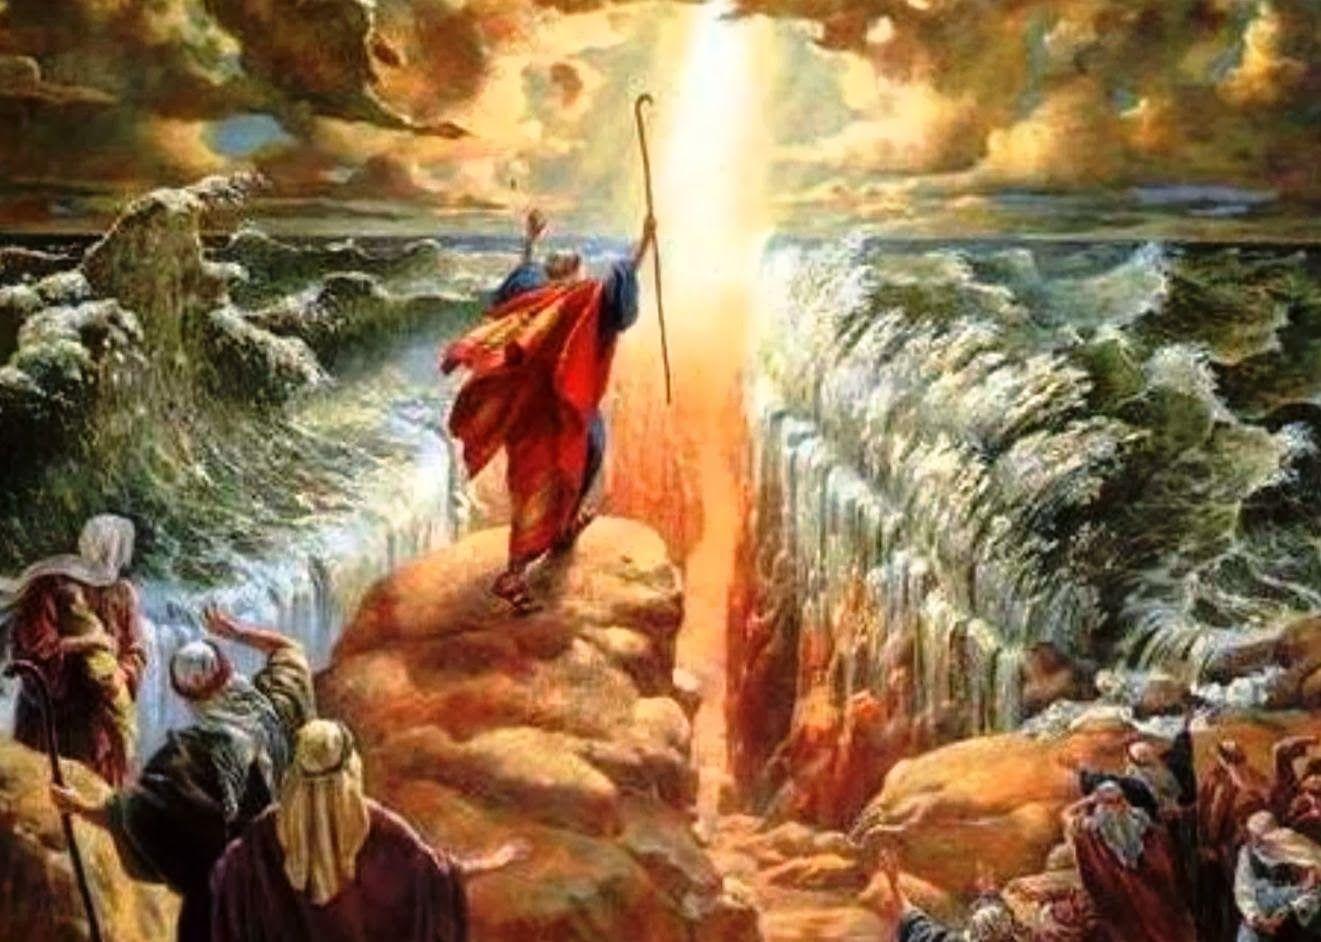 Speramus-(We Hope!): Preternatural vs Supernatural Points for Discernment  Regarding Medjugorje | Parting the red sea, Moses red sea, Red sea